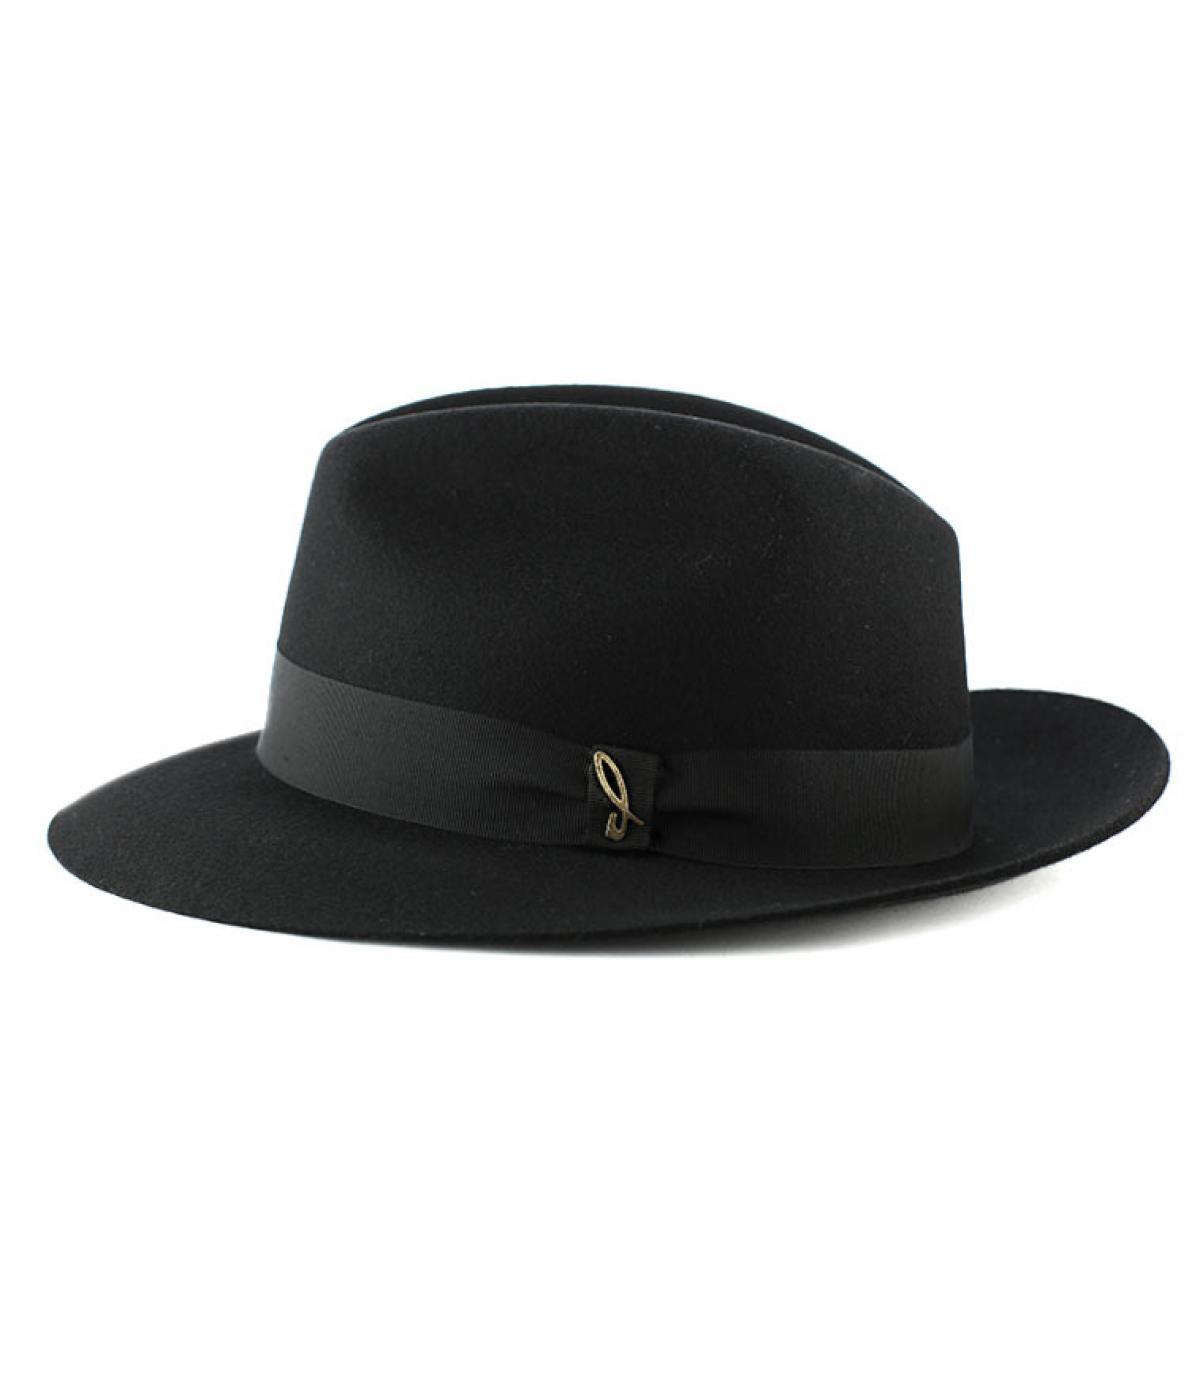 Sombrero feutre Doria negro